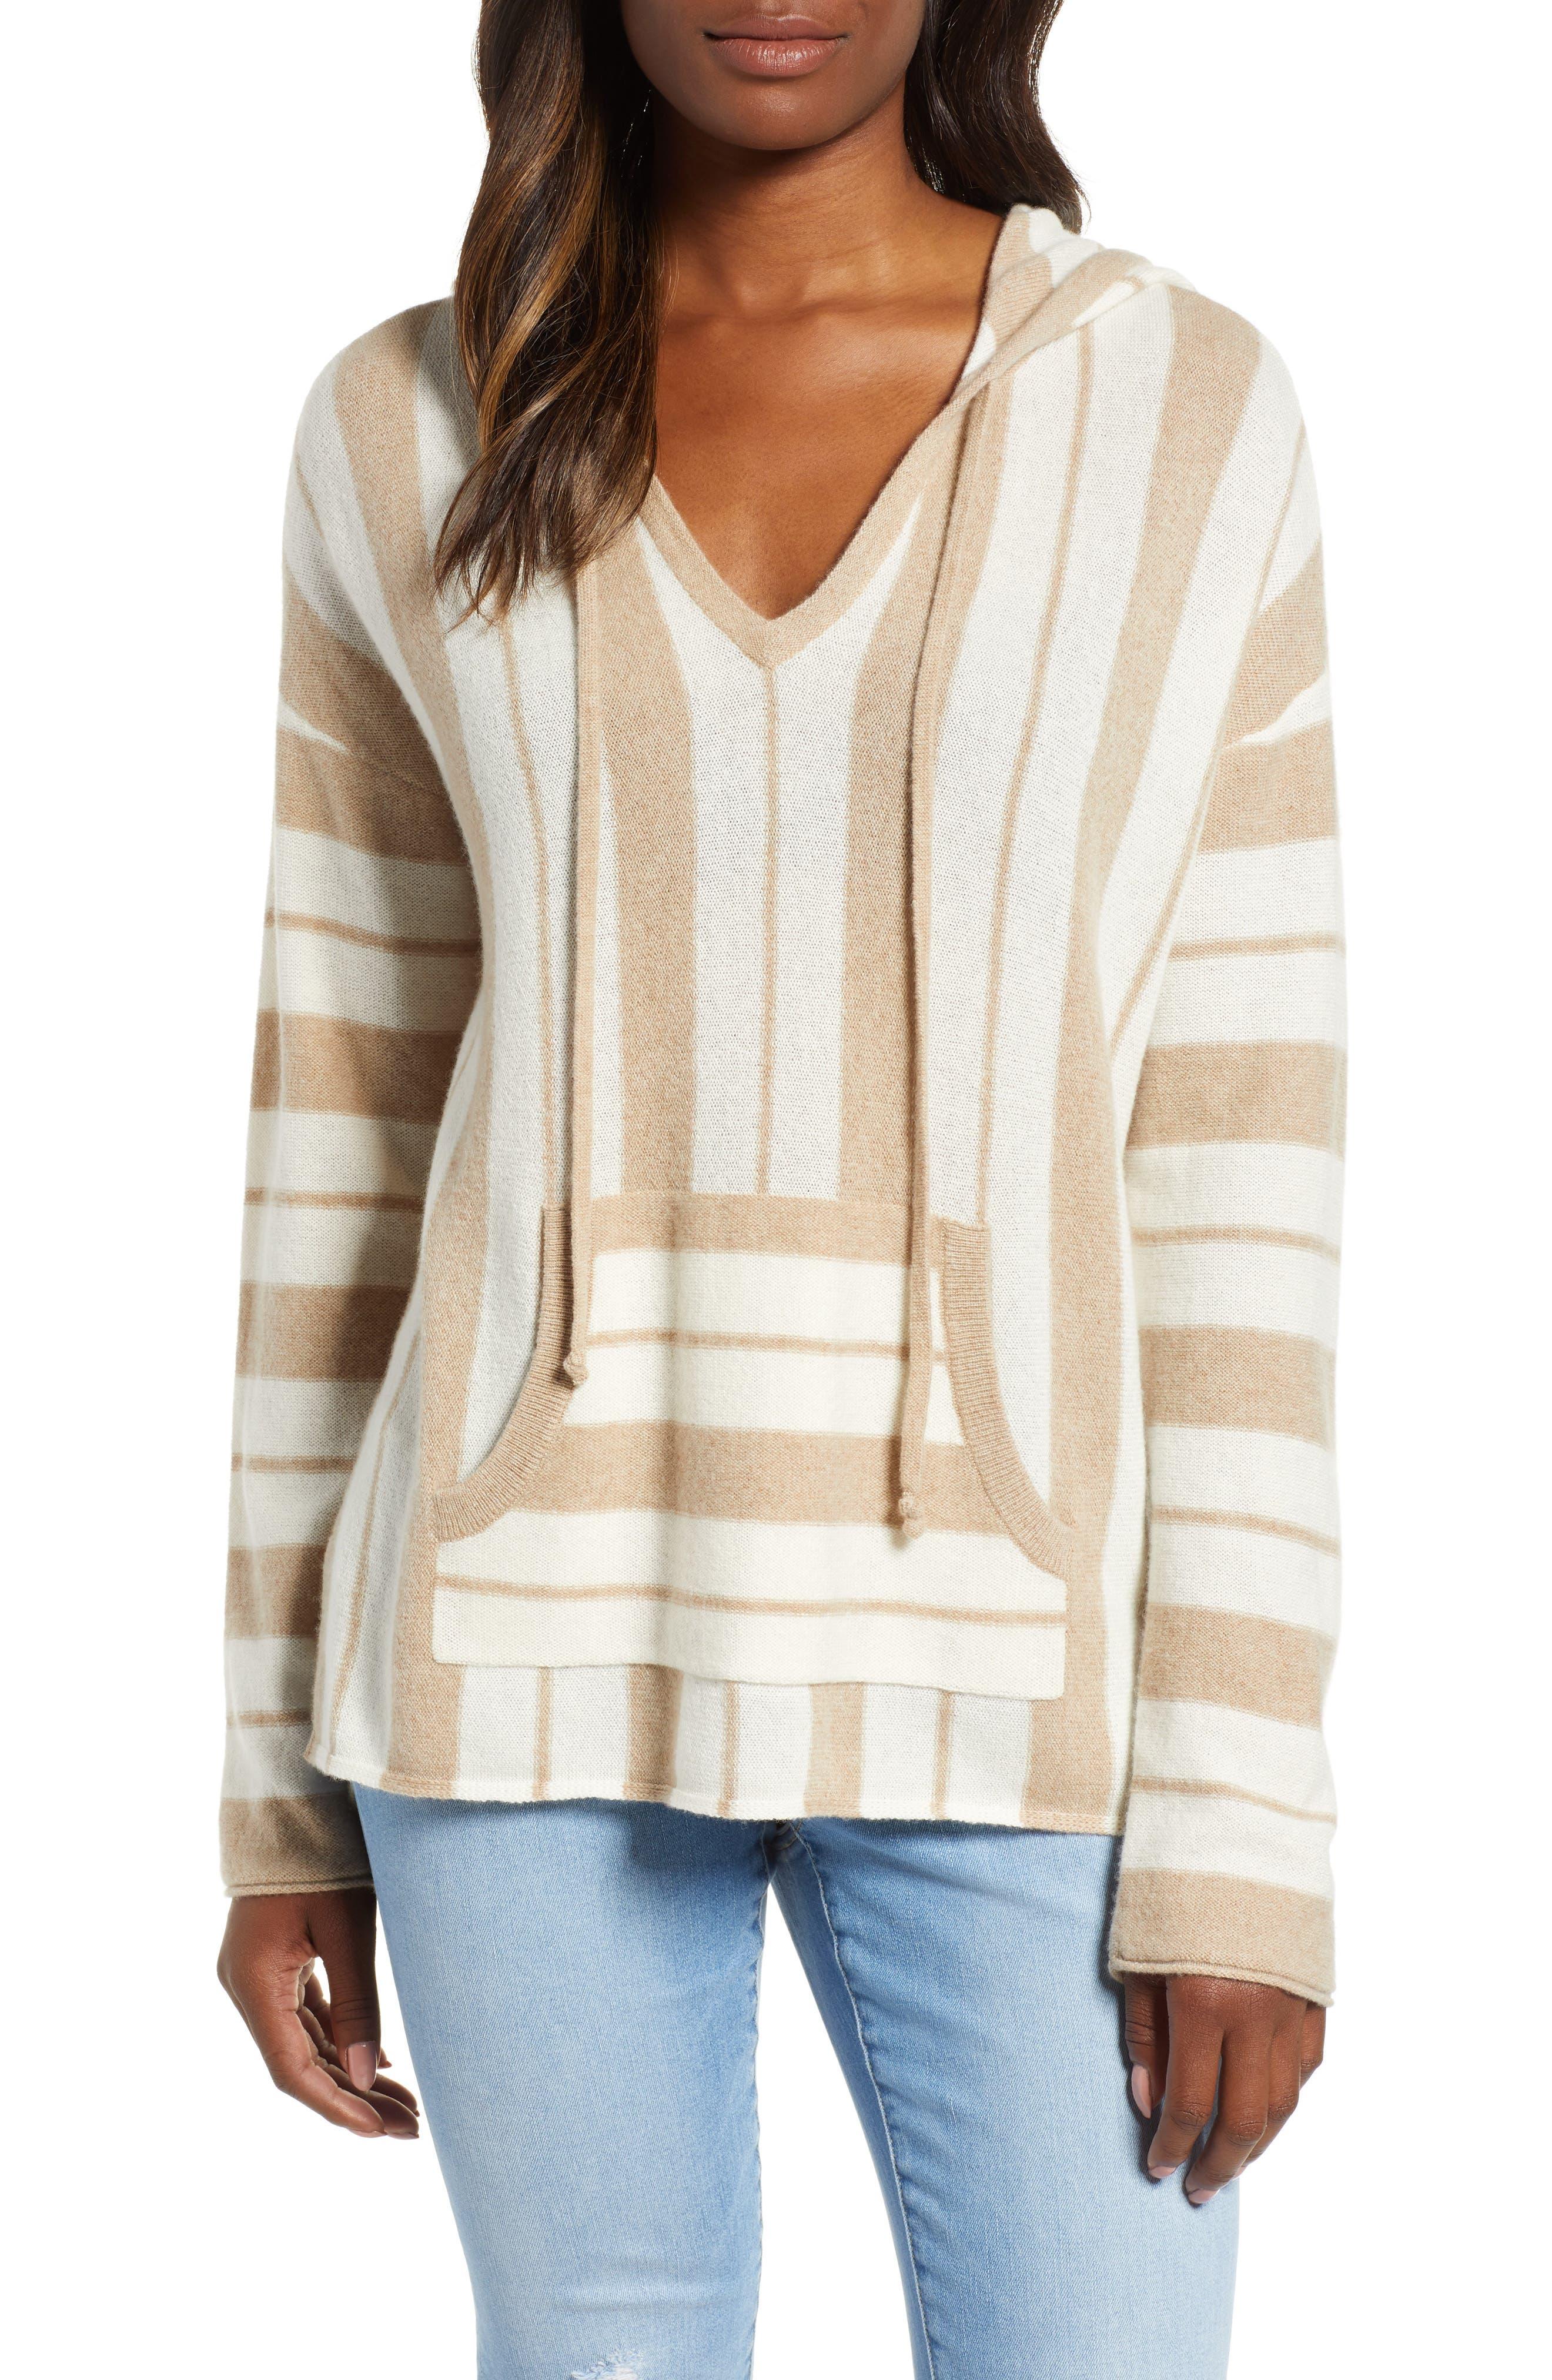 TOMMY BAHAMA Serena Stripe Baja Pullover Top in Golden Honey Heather